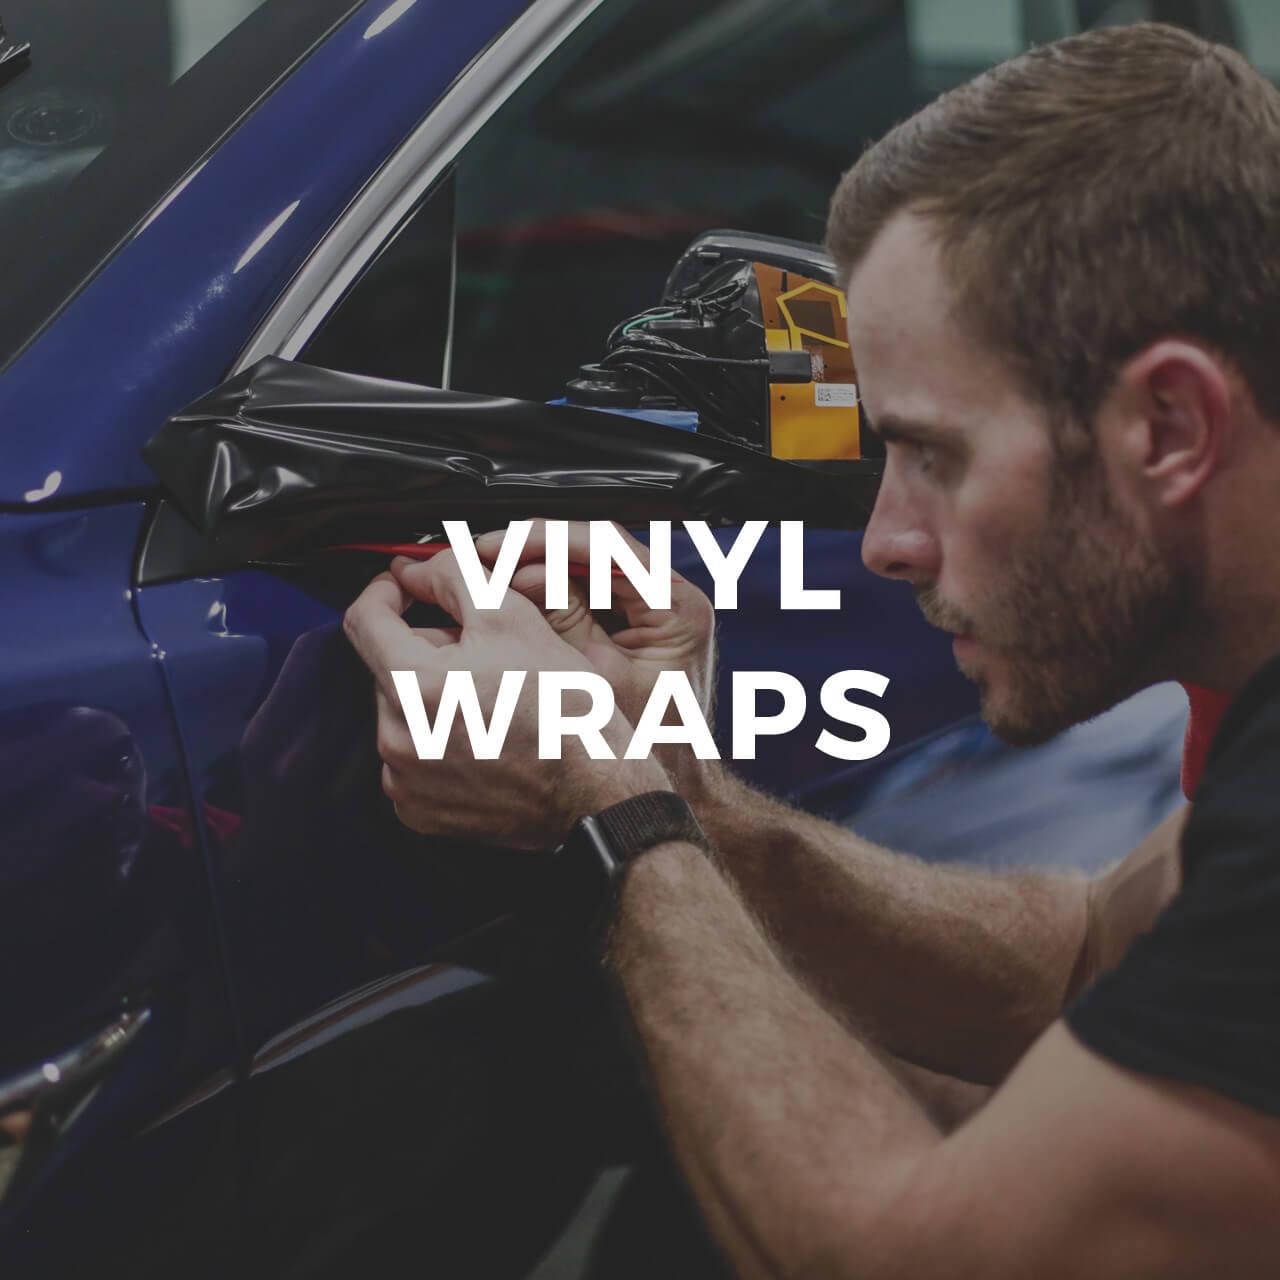 American Wrap Co Vinyl Wraps